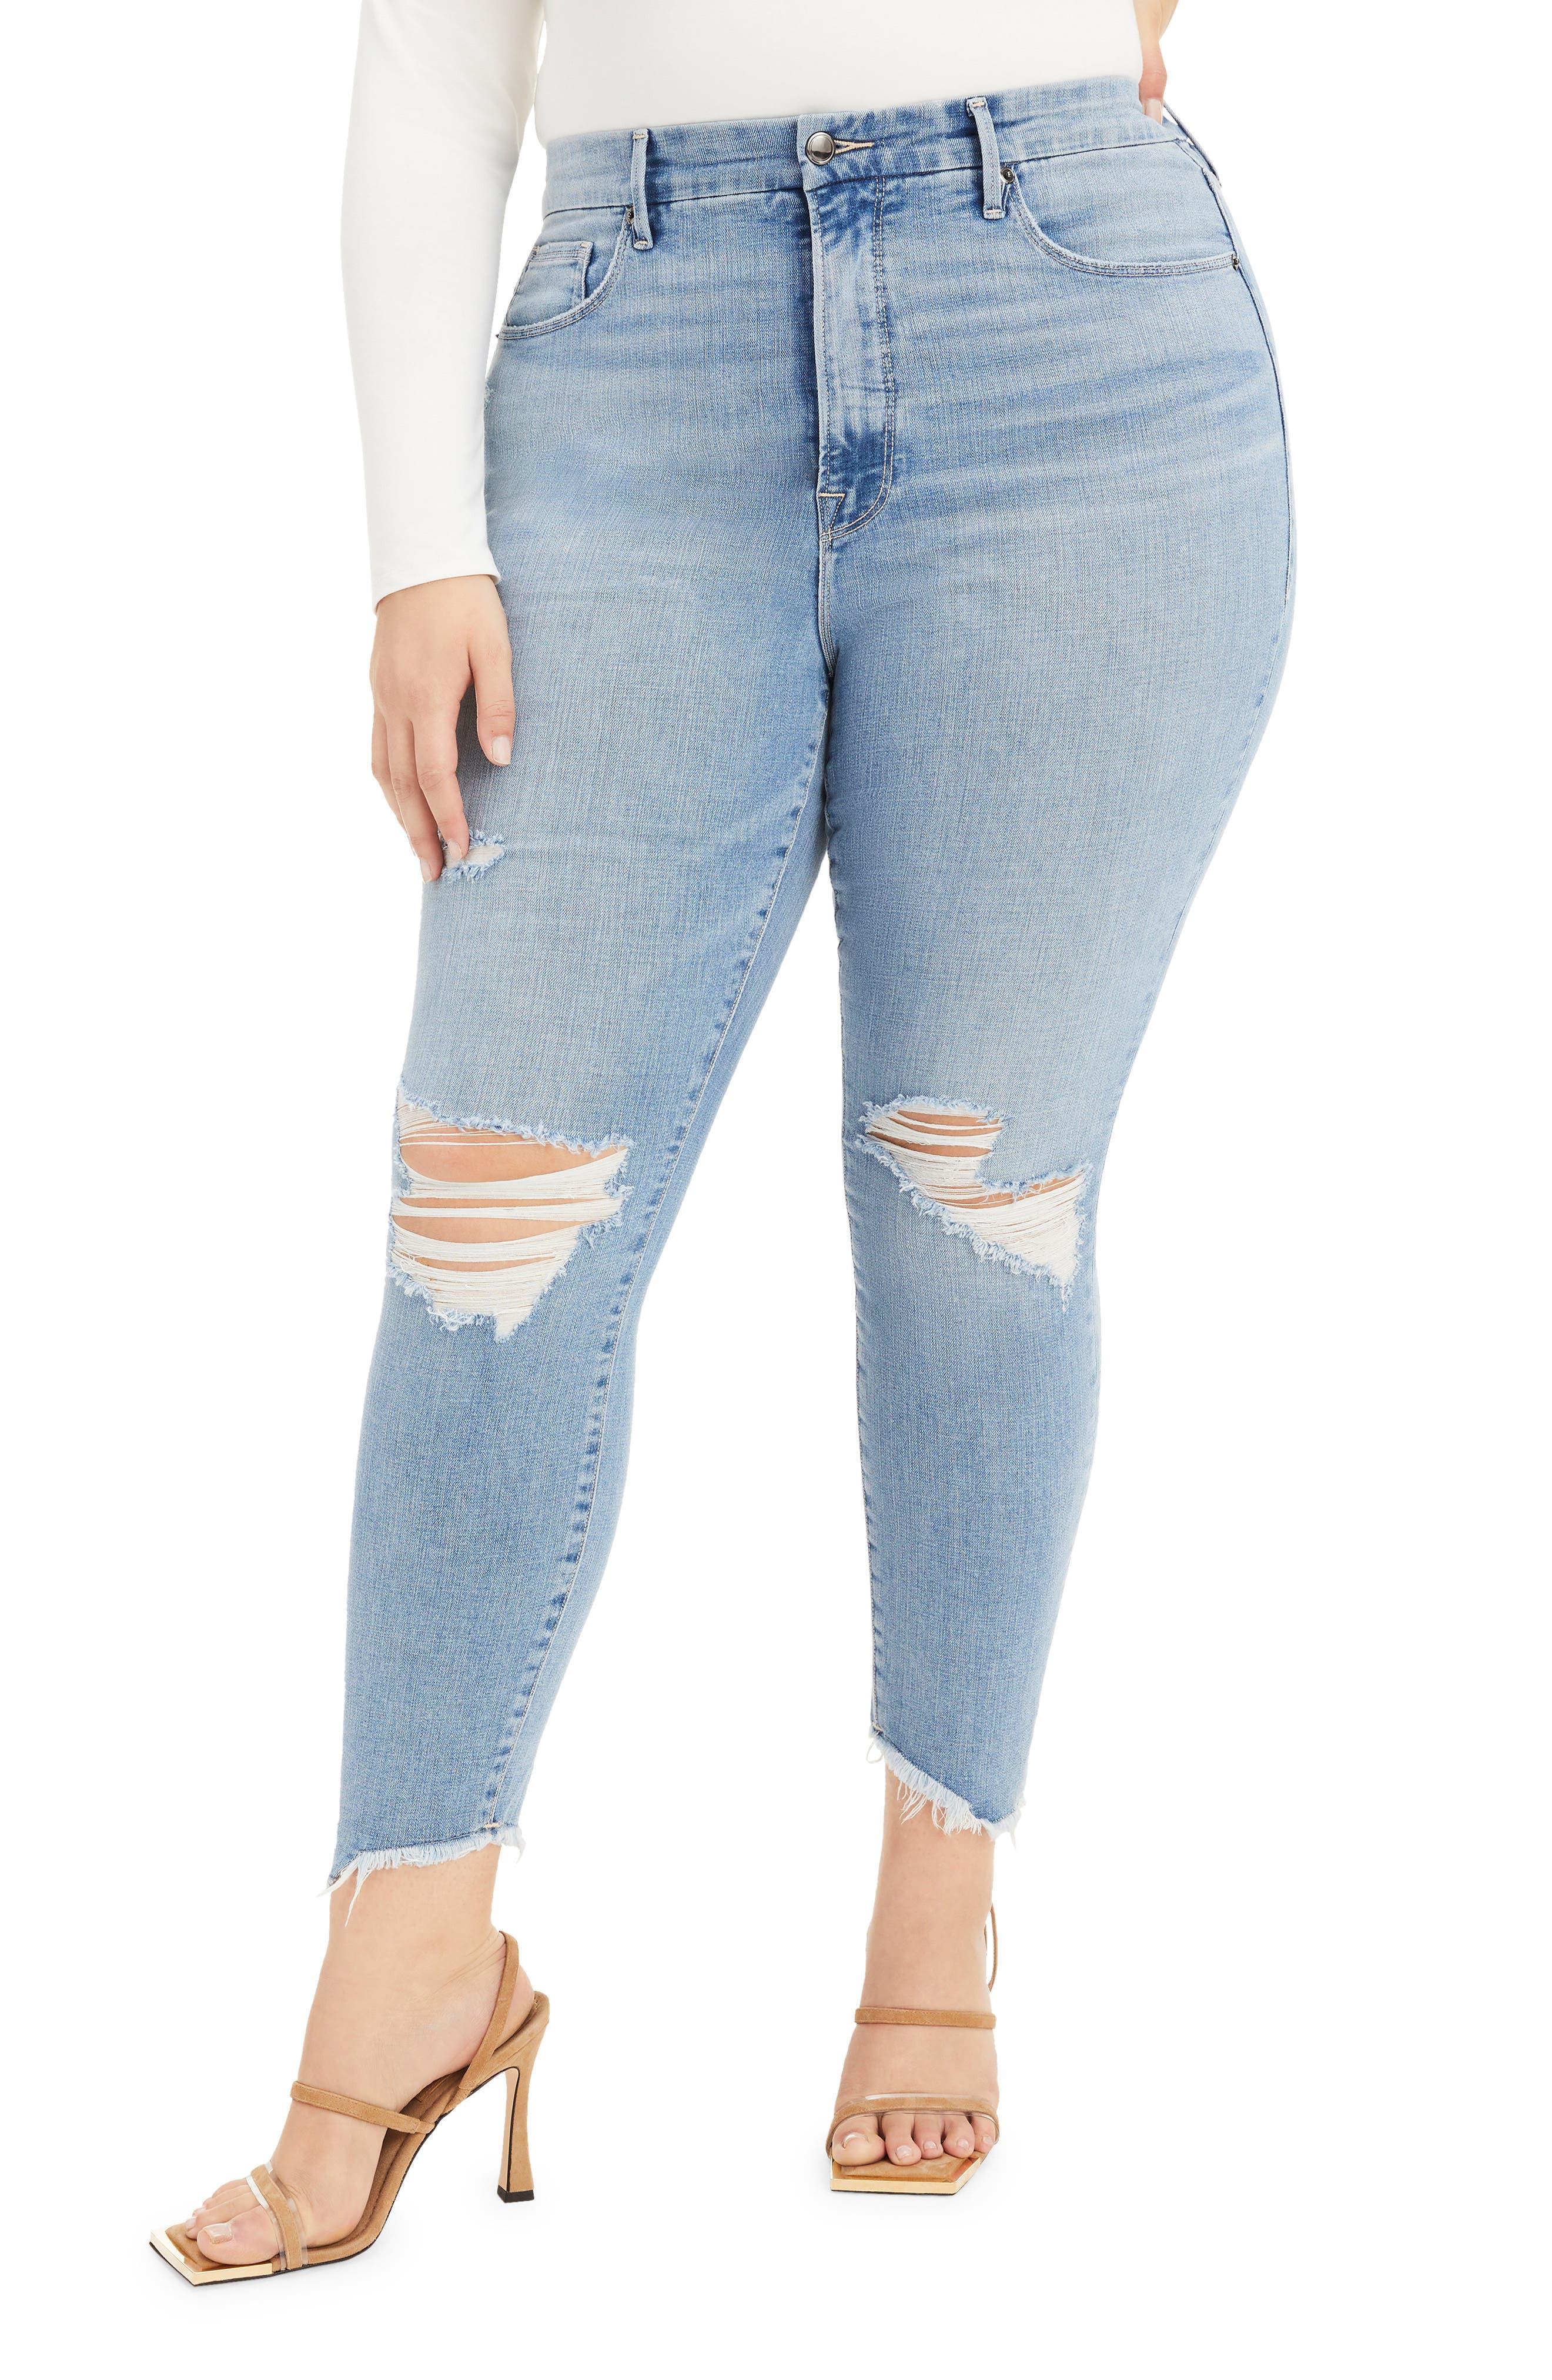 Plus Women's Good American Good Legs High Waist Side Step Crop Skinny Jeans